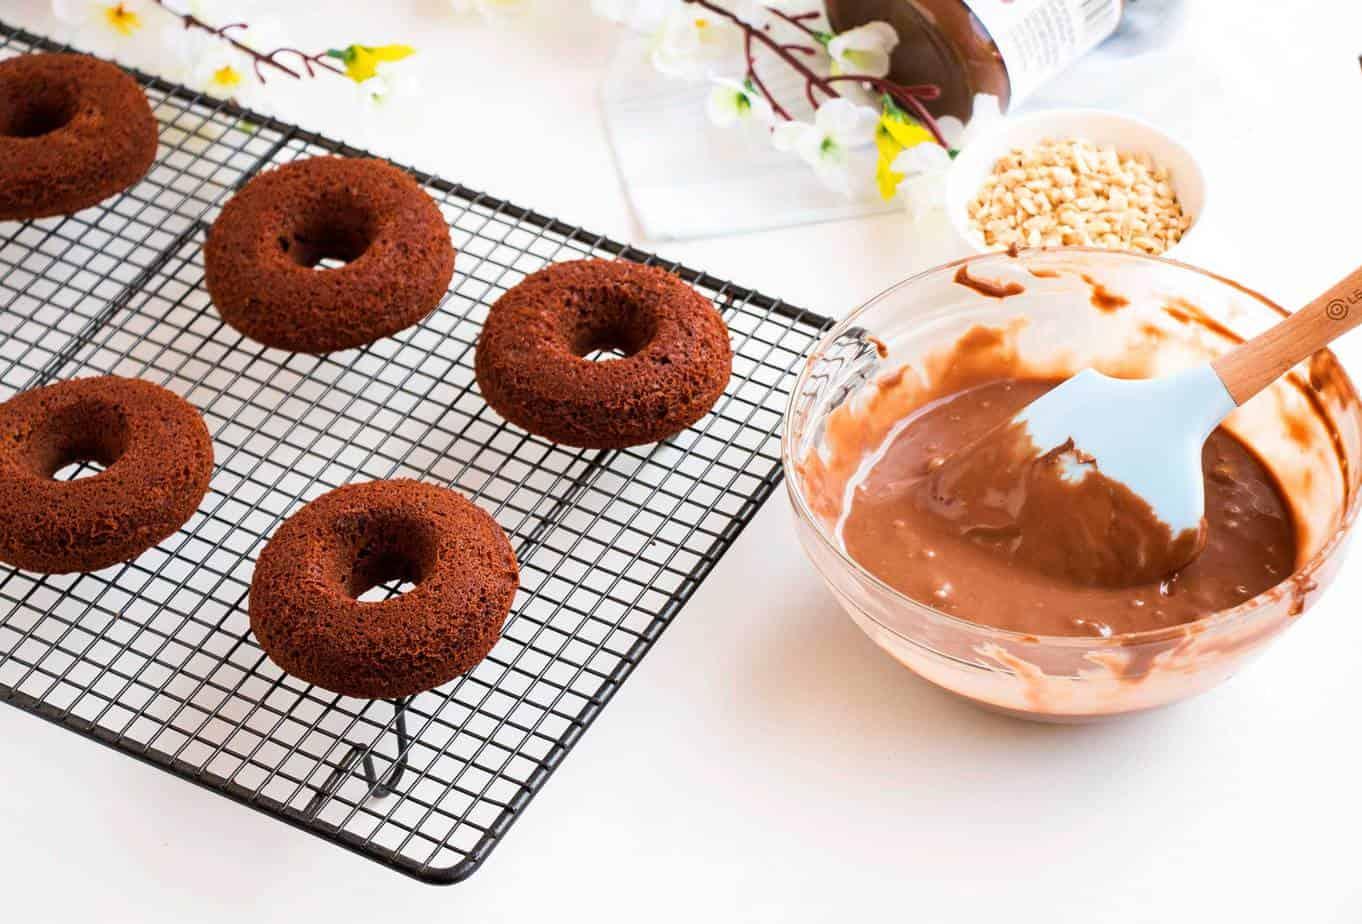 Easy chocolate cake donut recipe